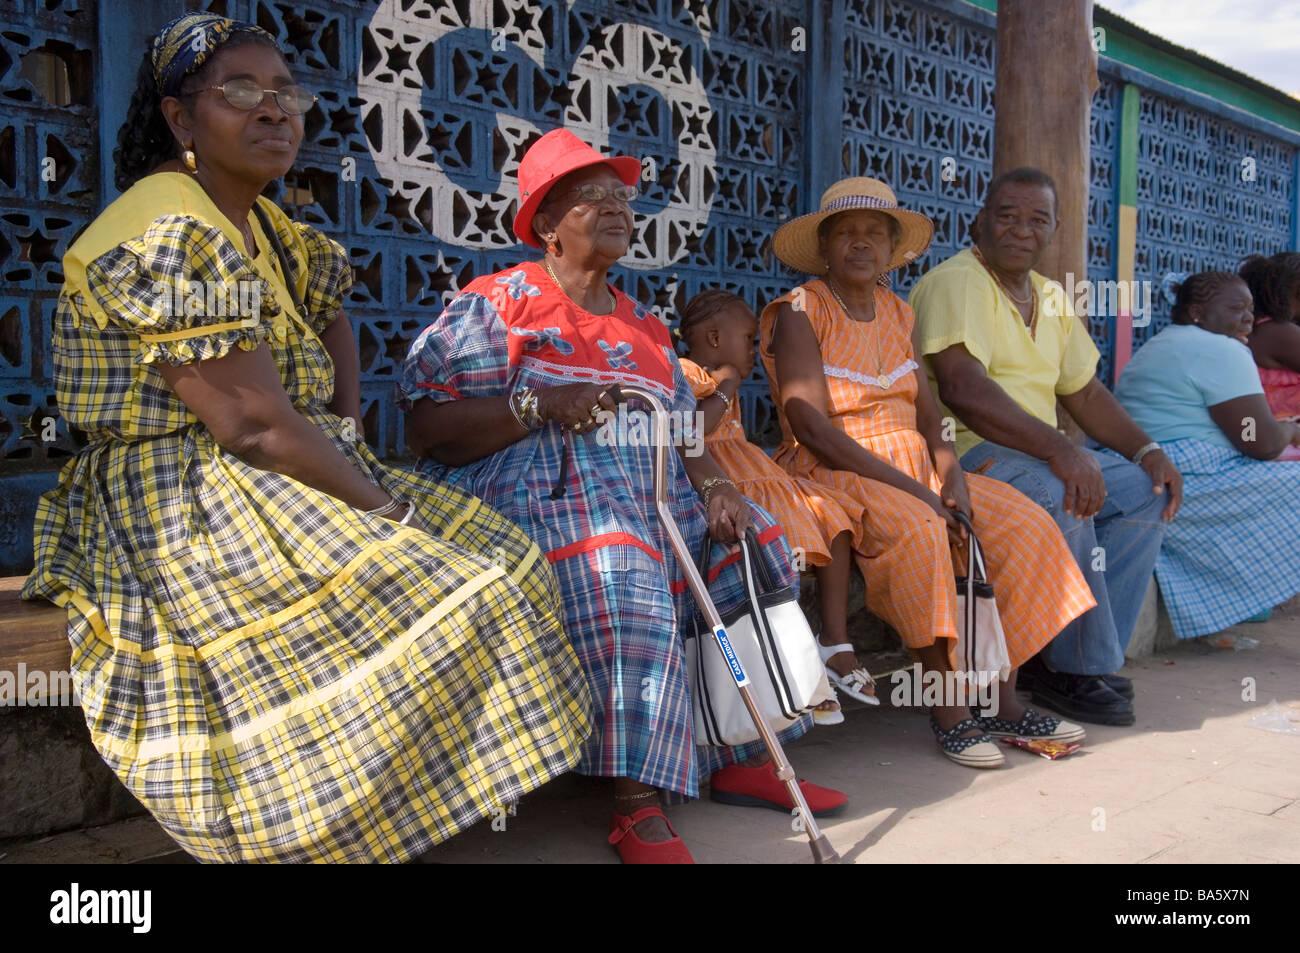 Garifuna women sitting on a bench during the annual Garifuna festival in Livingston, Guatemala. - Stock Image